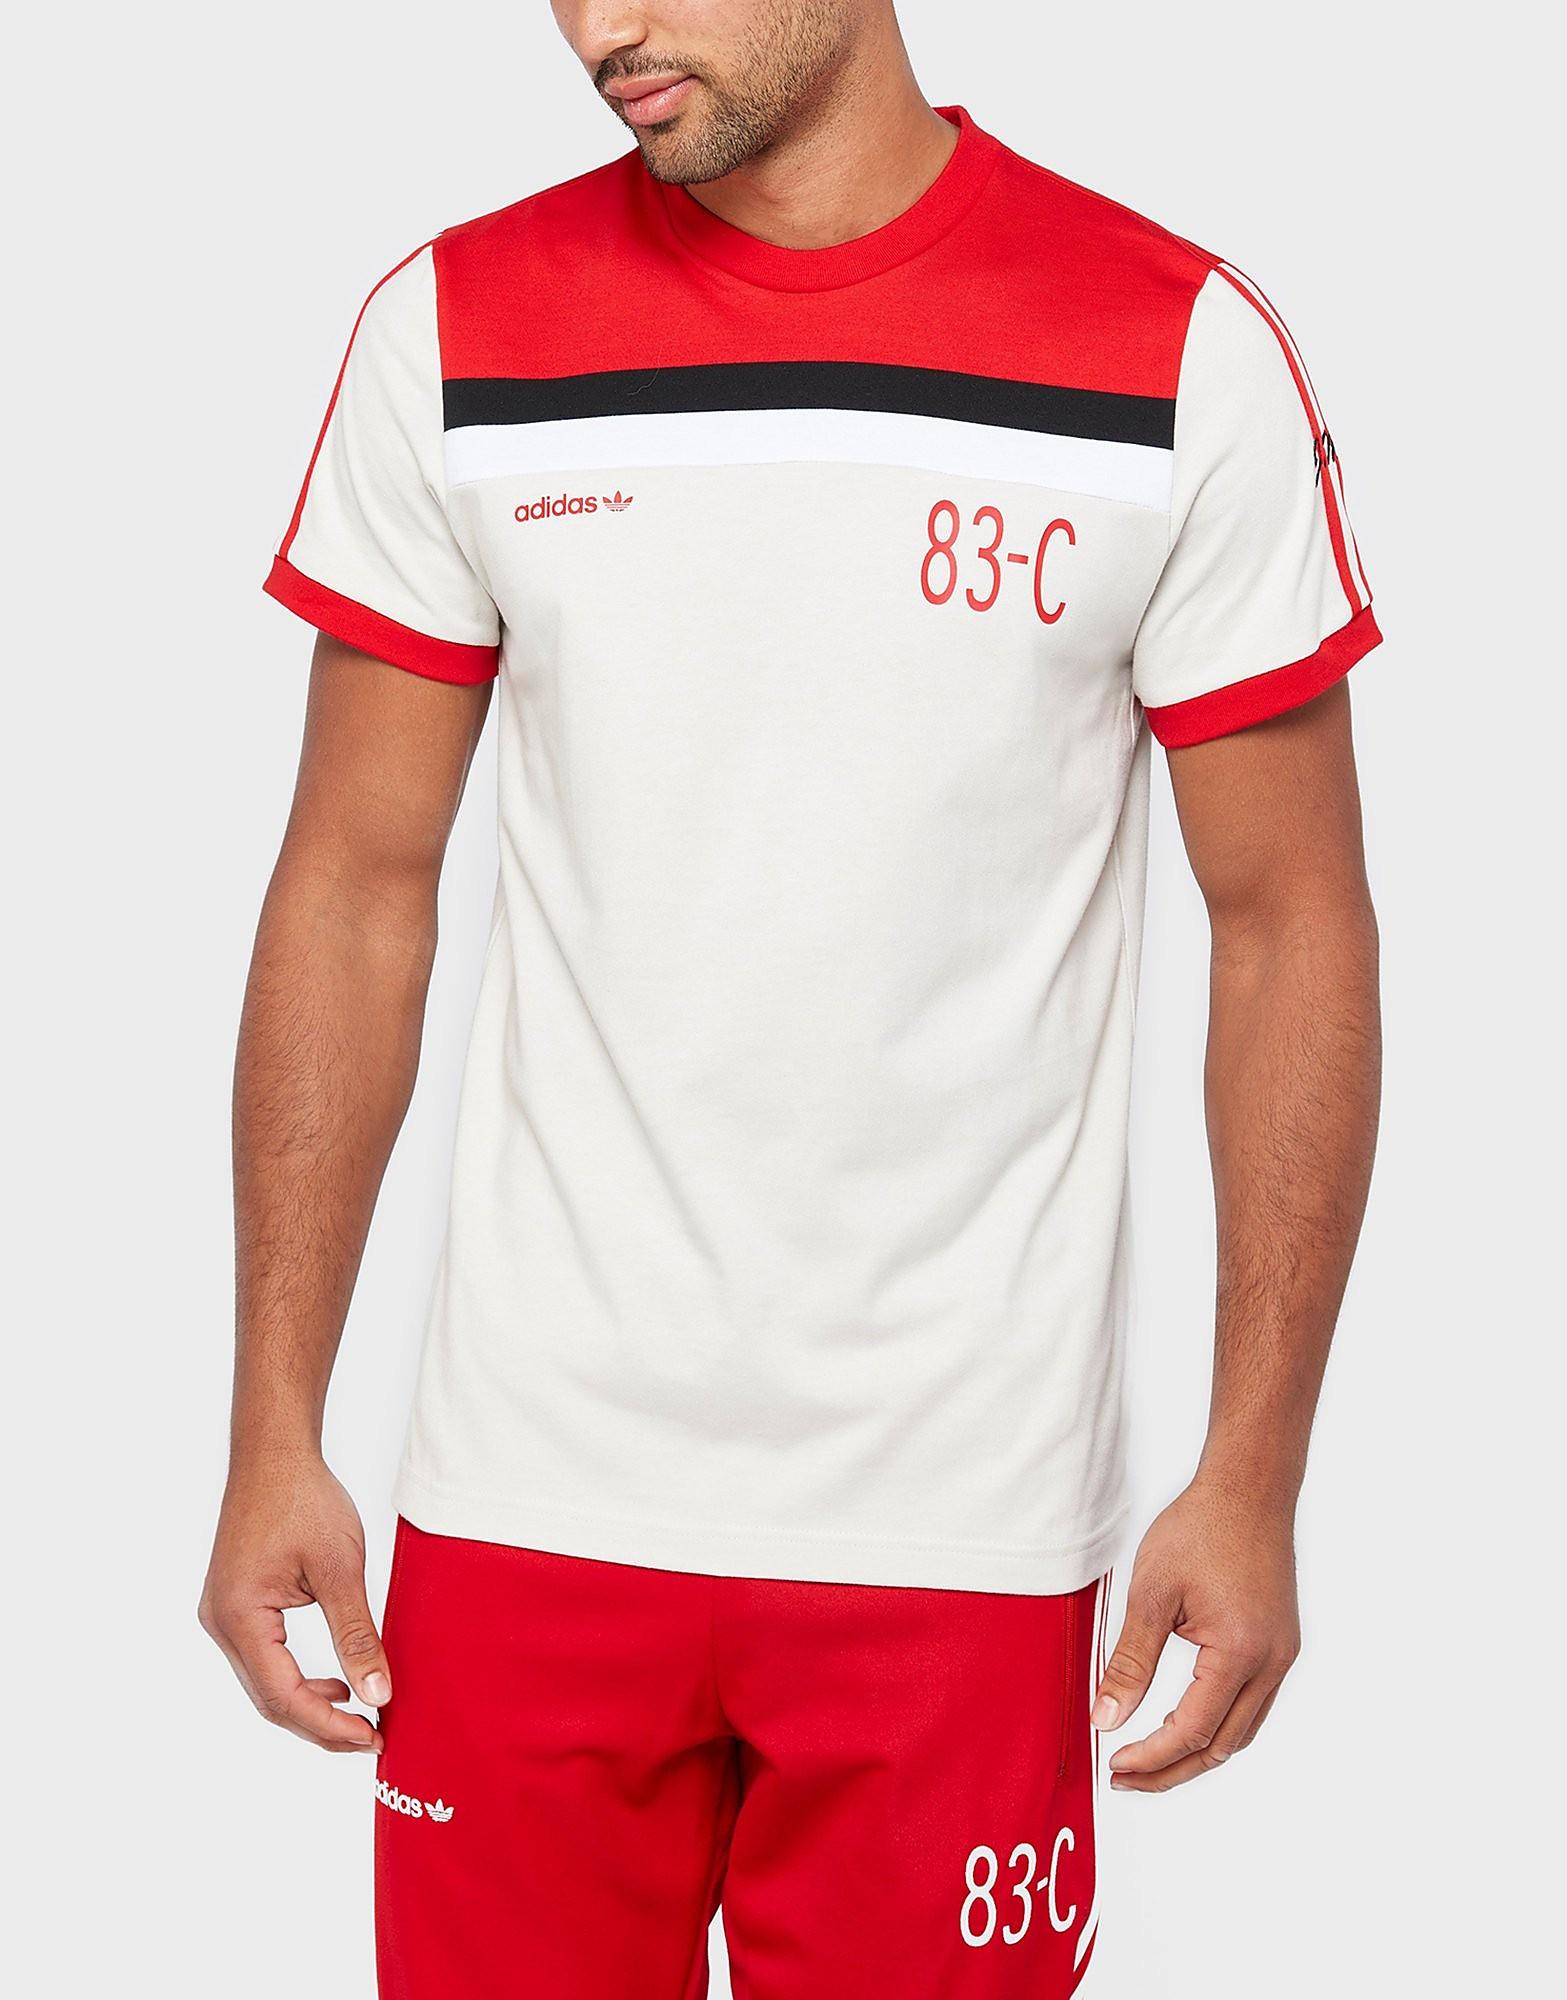 adidas Originals 83-C T-Shirt